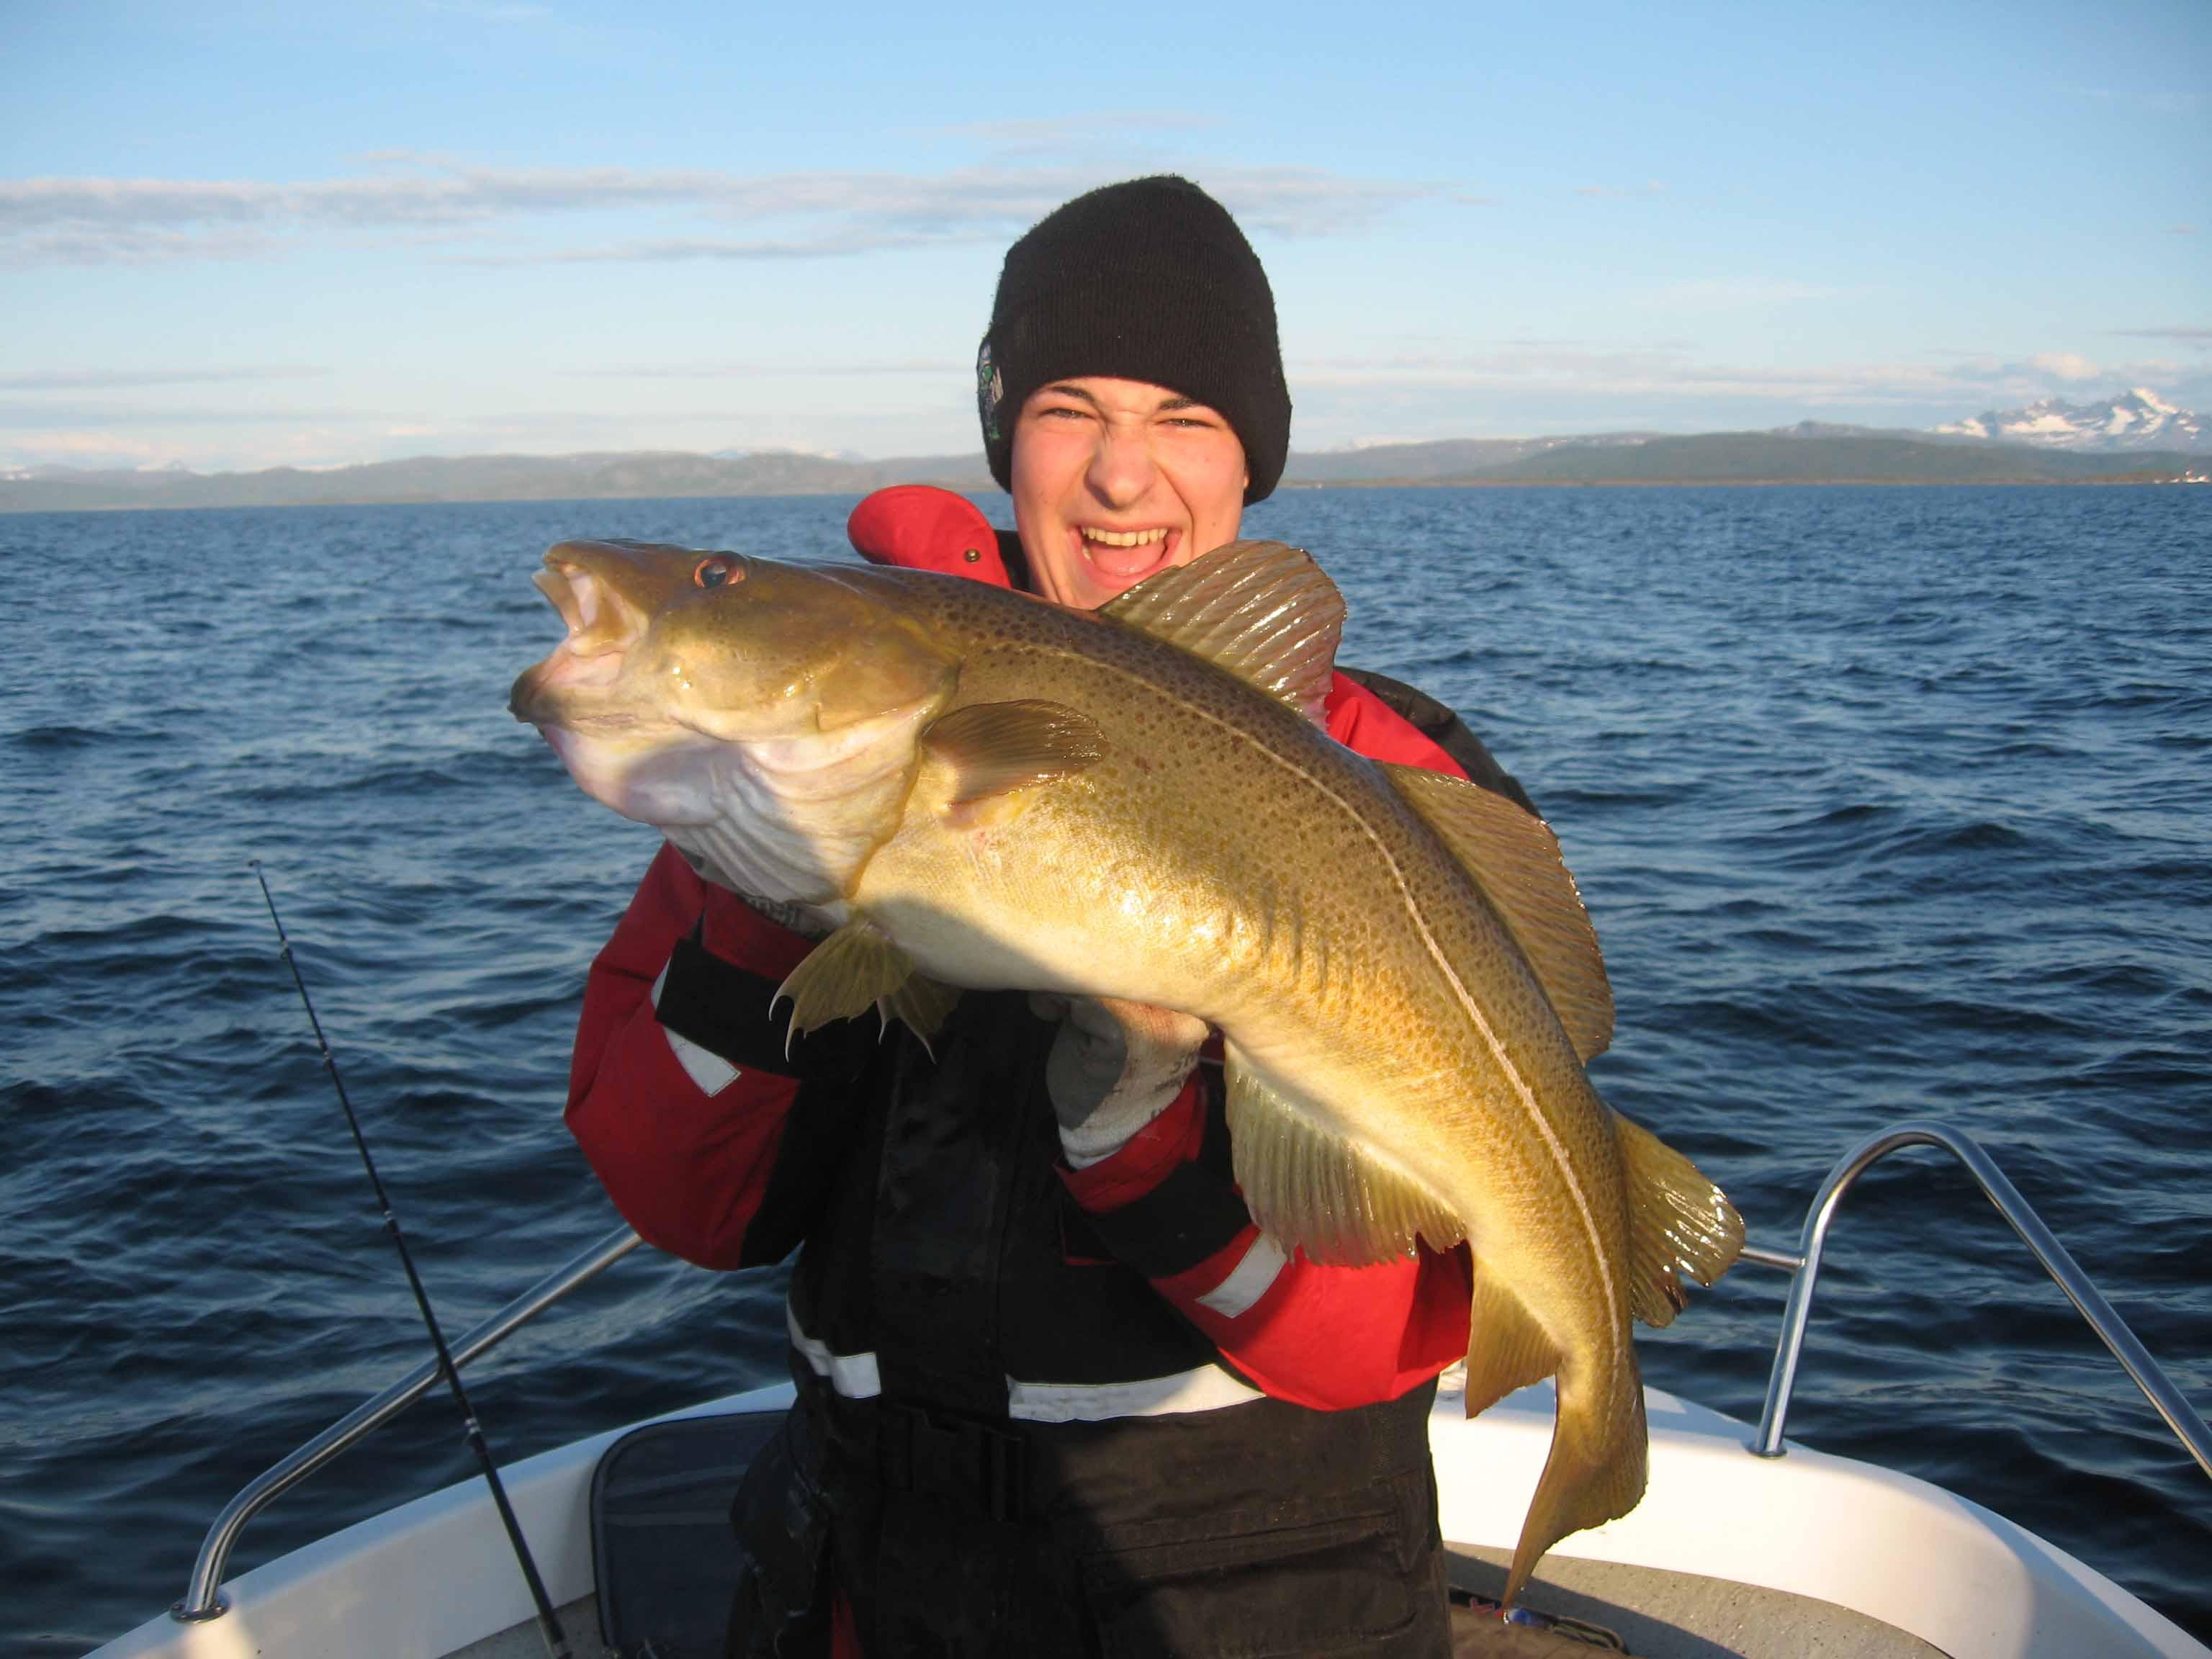 Lofot fishery